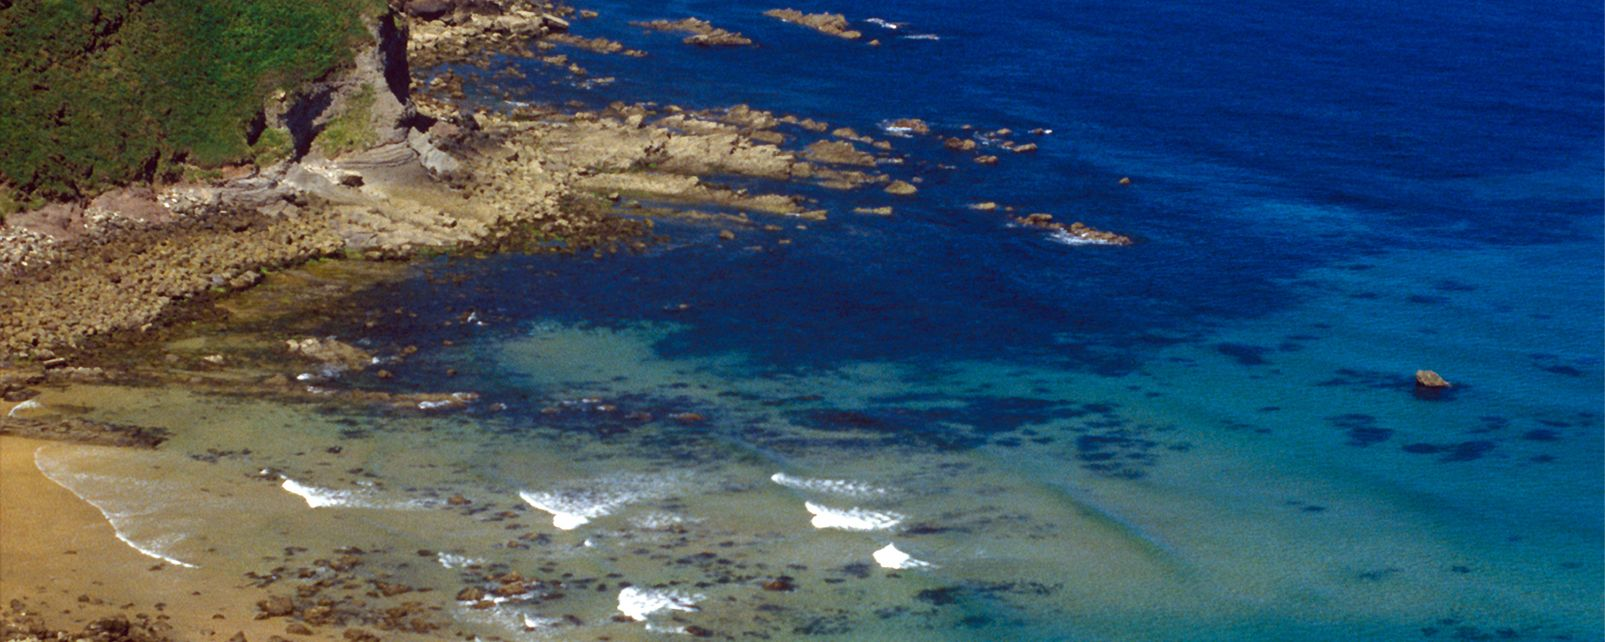 Les côtes, europe, espagne, asturies, el sabin, crique, atlantique, océan